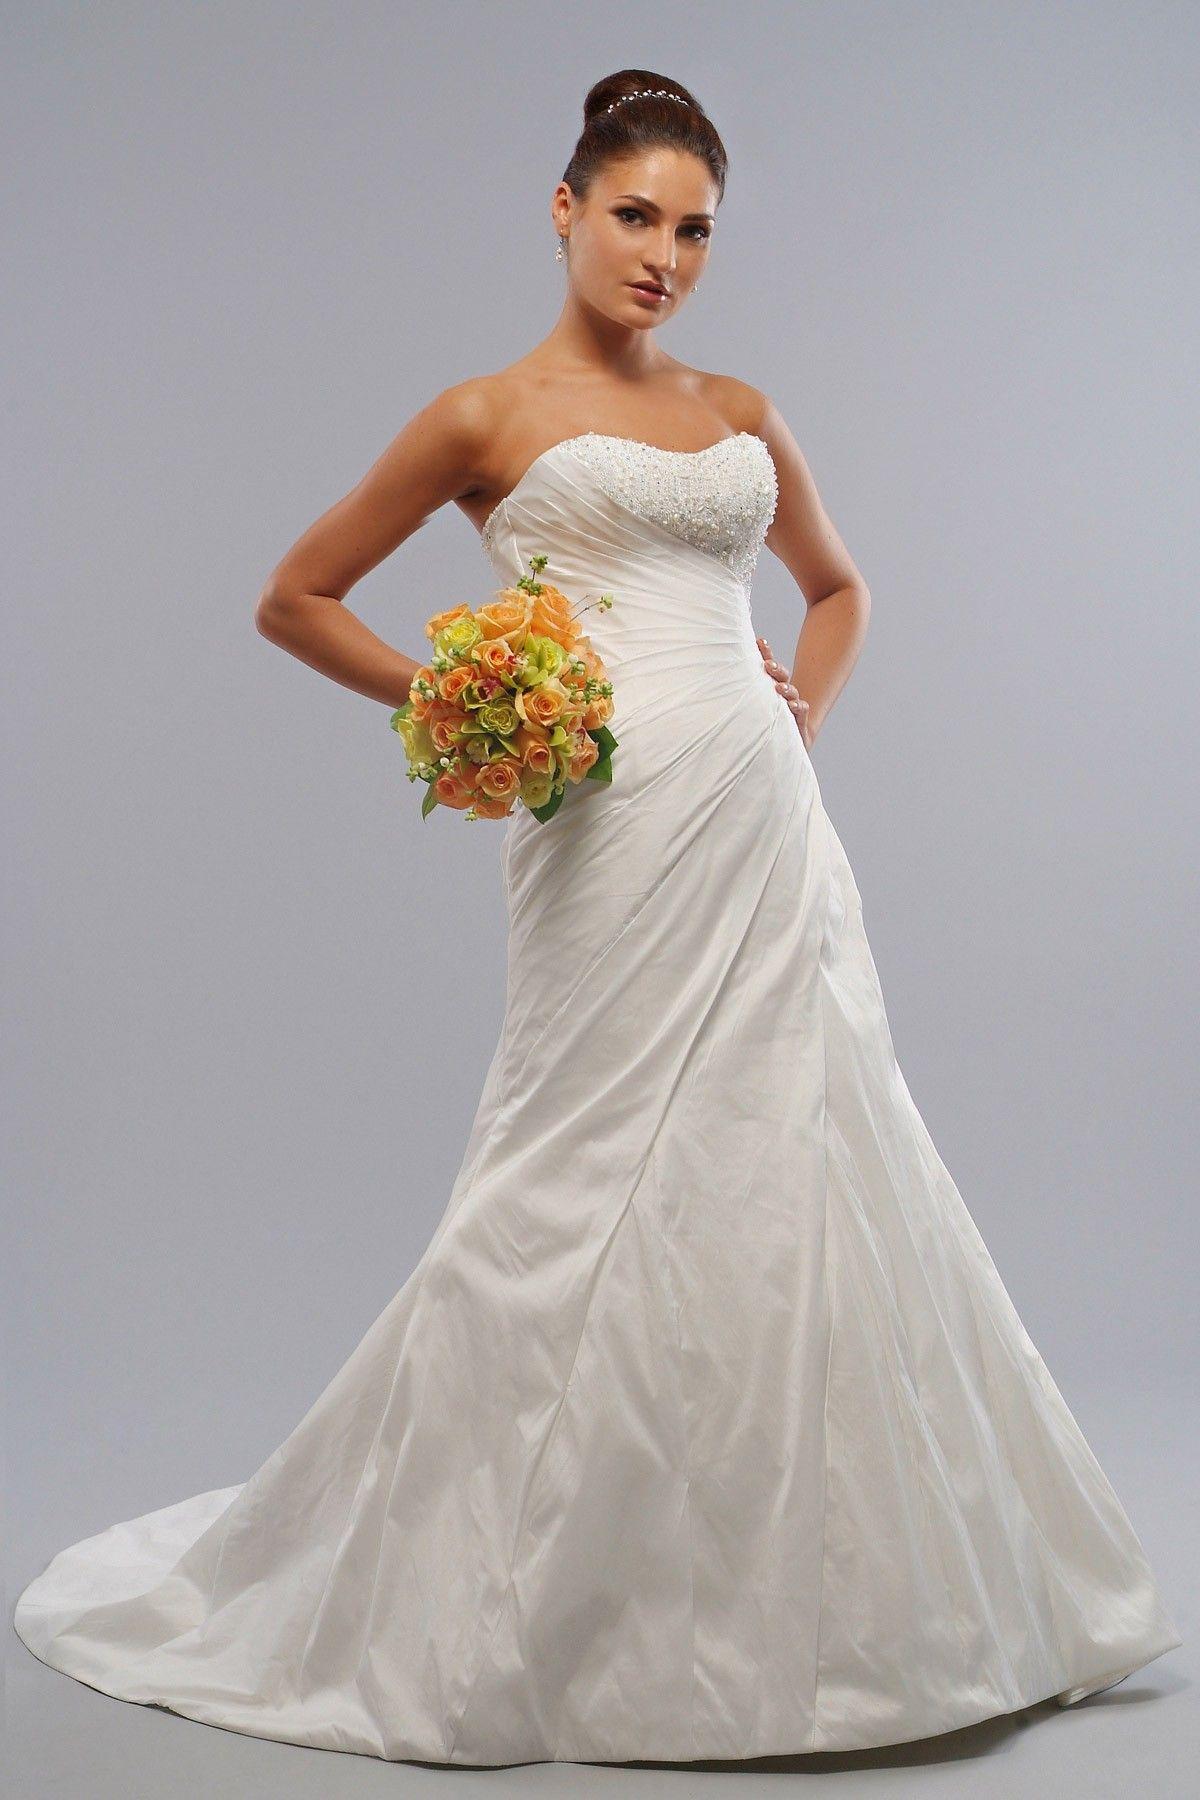 Taffeta Strapless Sweetheart Corset Bodice Aline Wedding